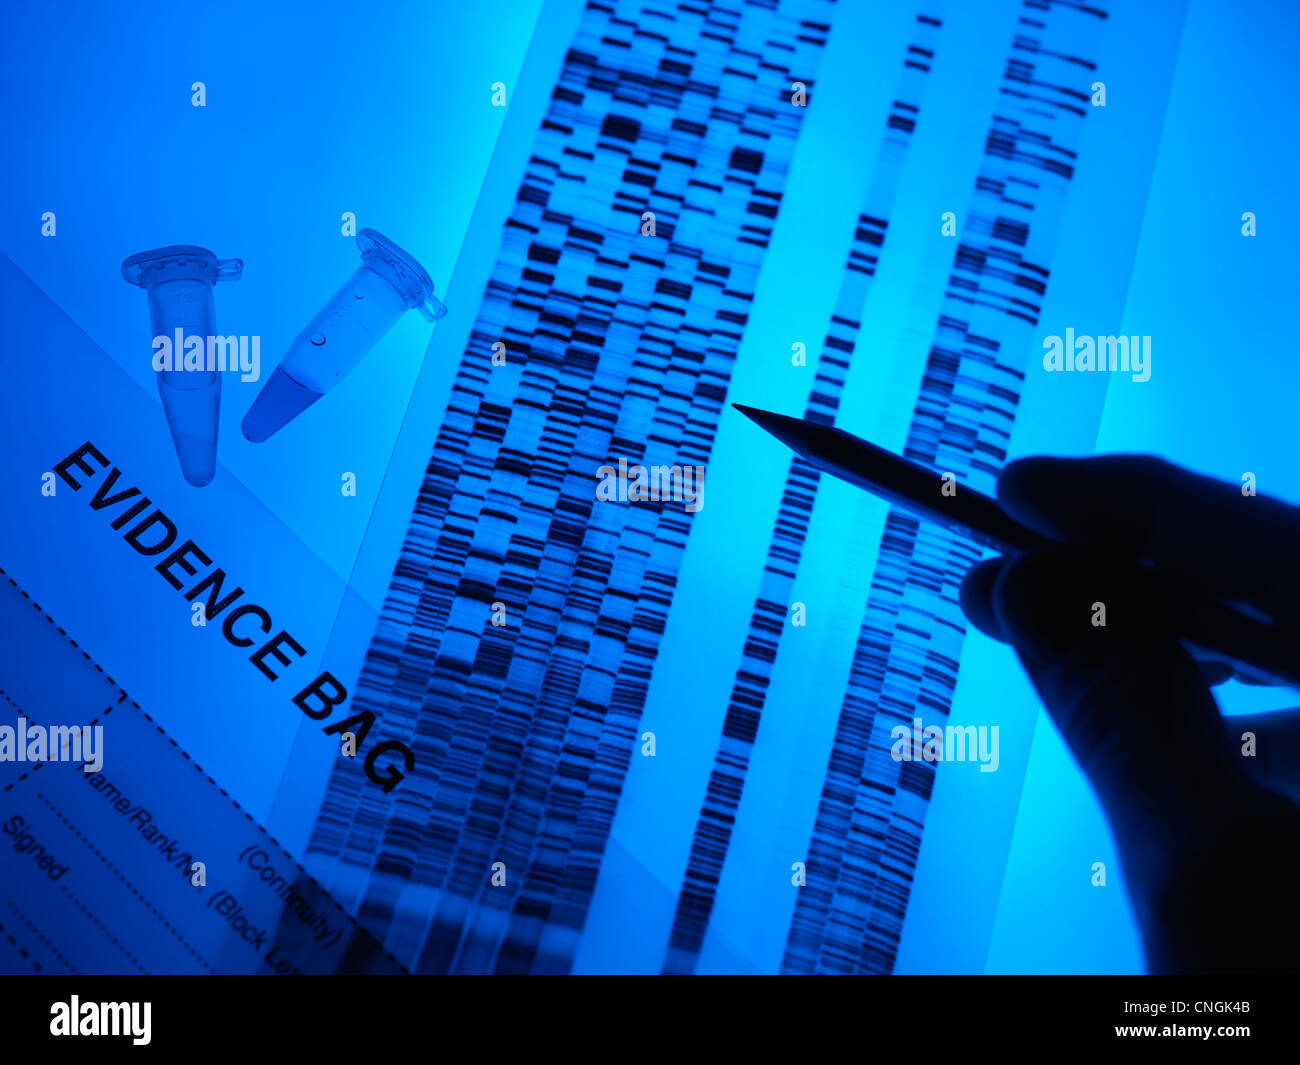 Forensic evidence - Stock Image